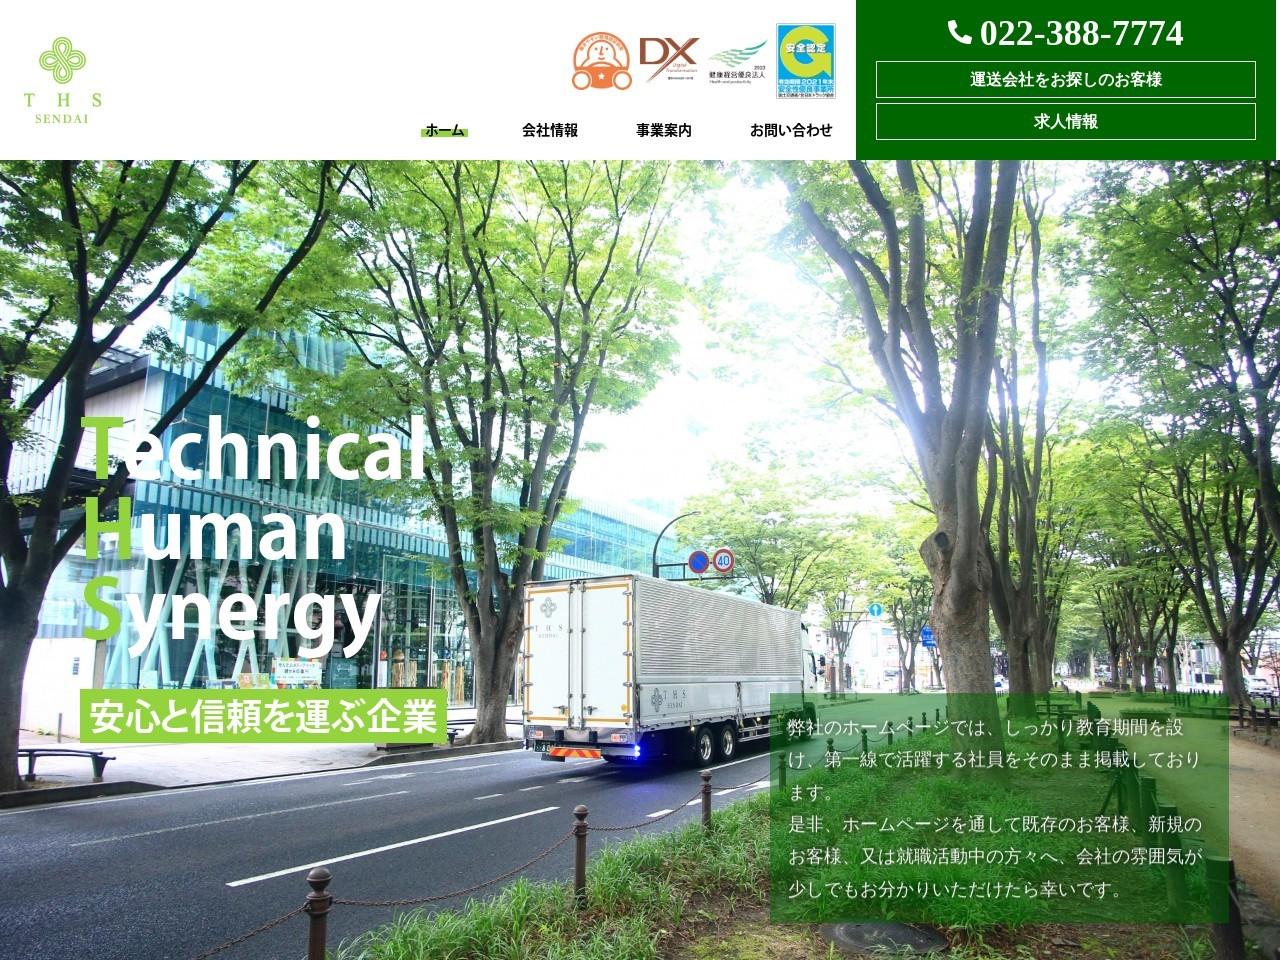 THS仙台株式会社